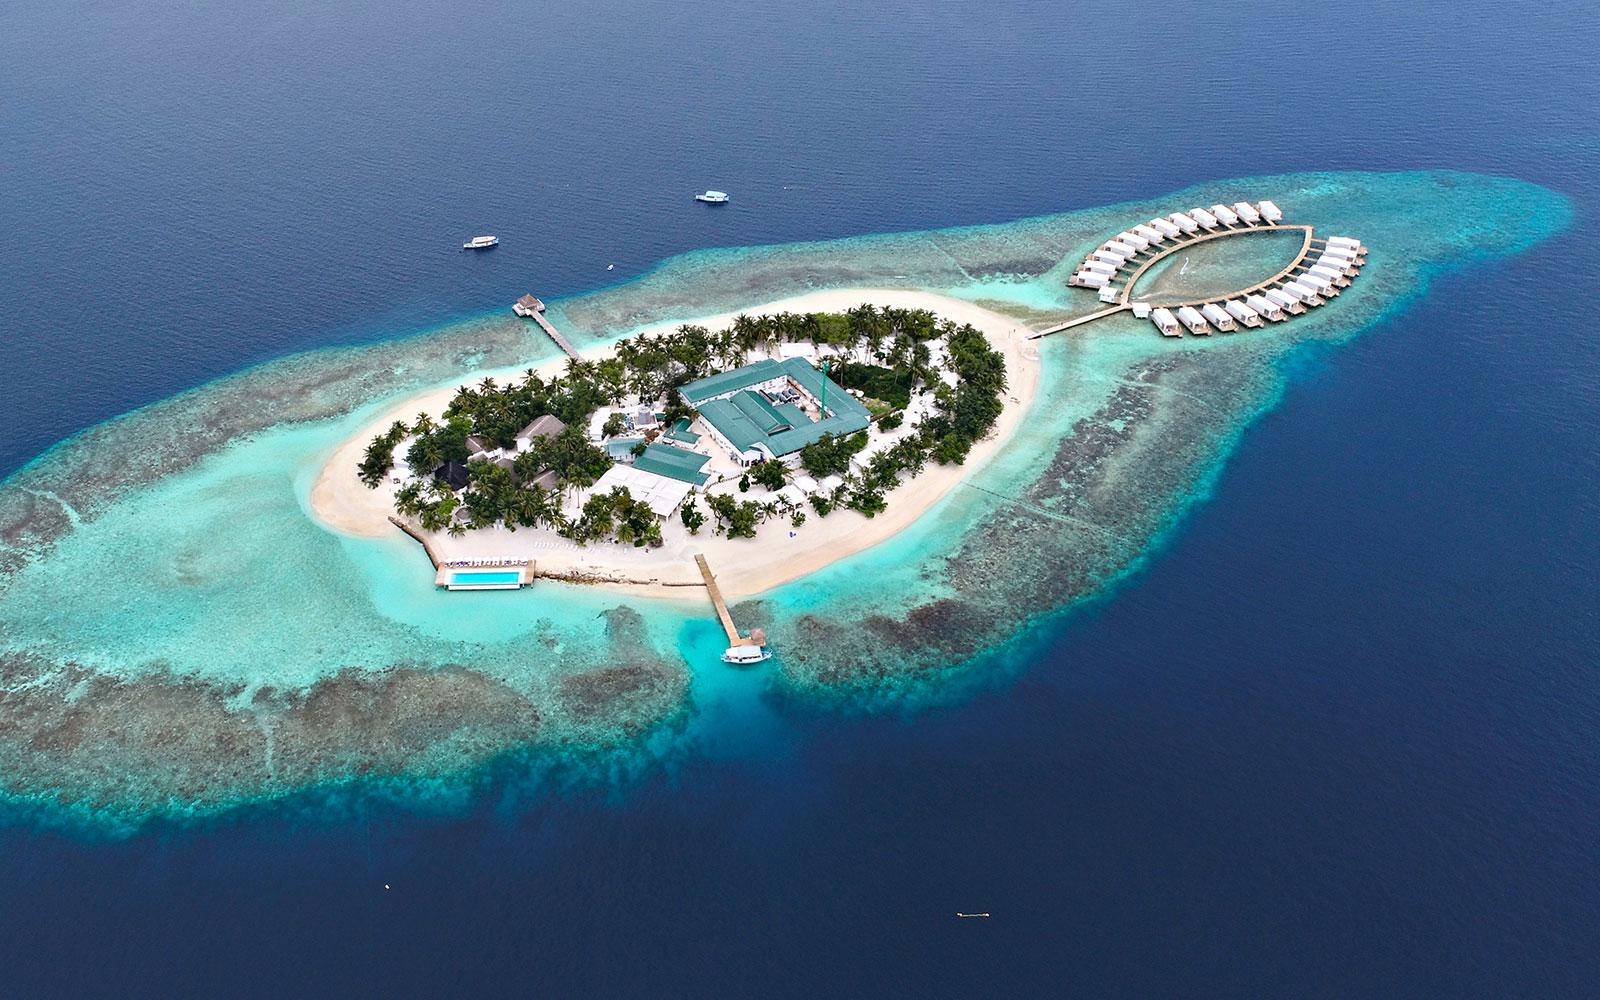 Maldive_271119_1453.jpg